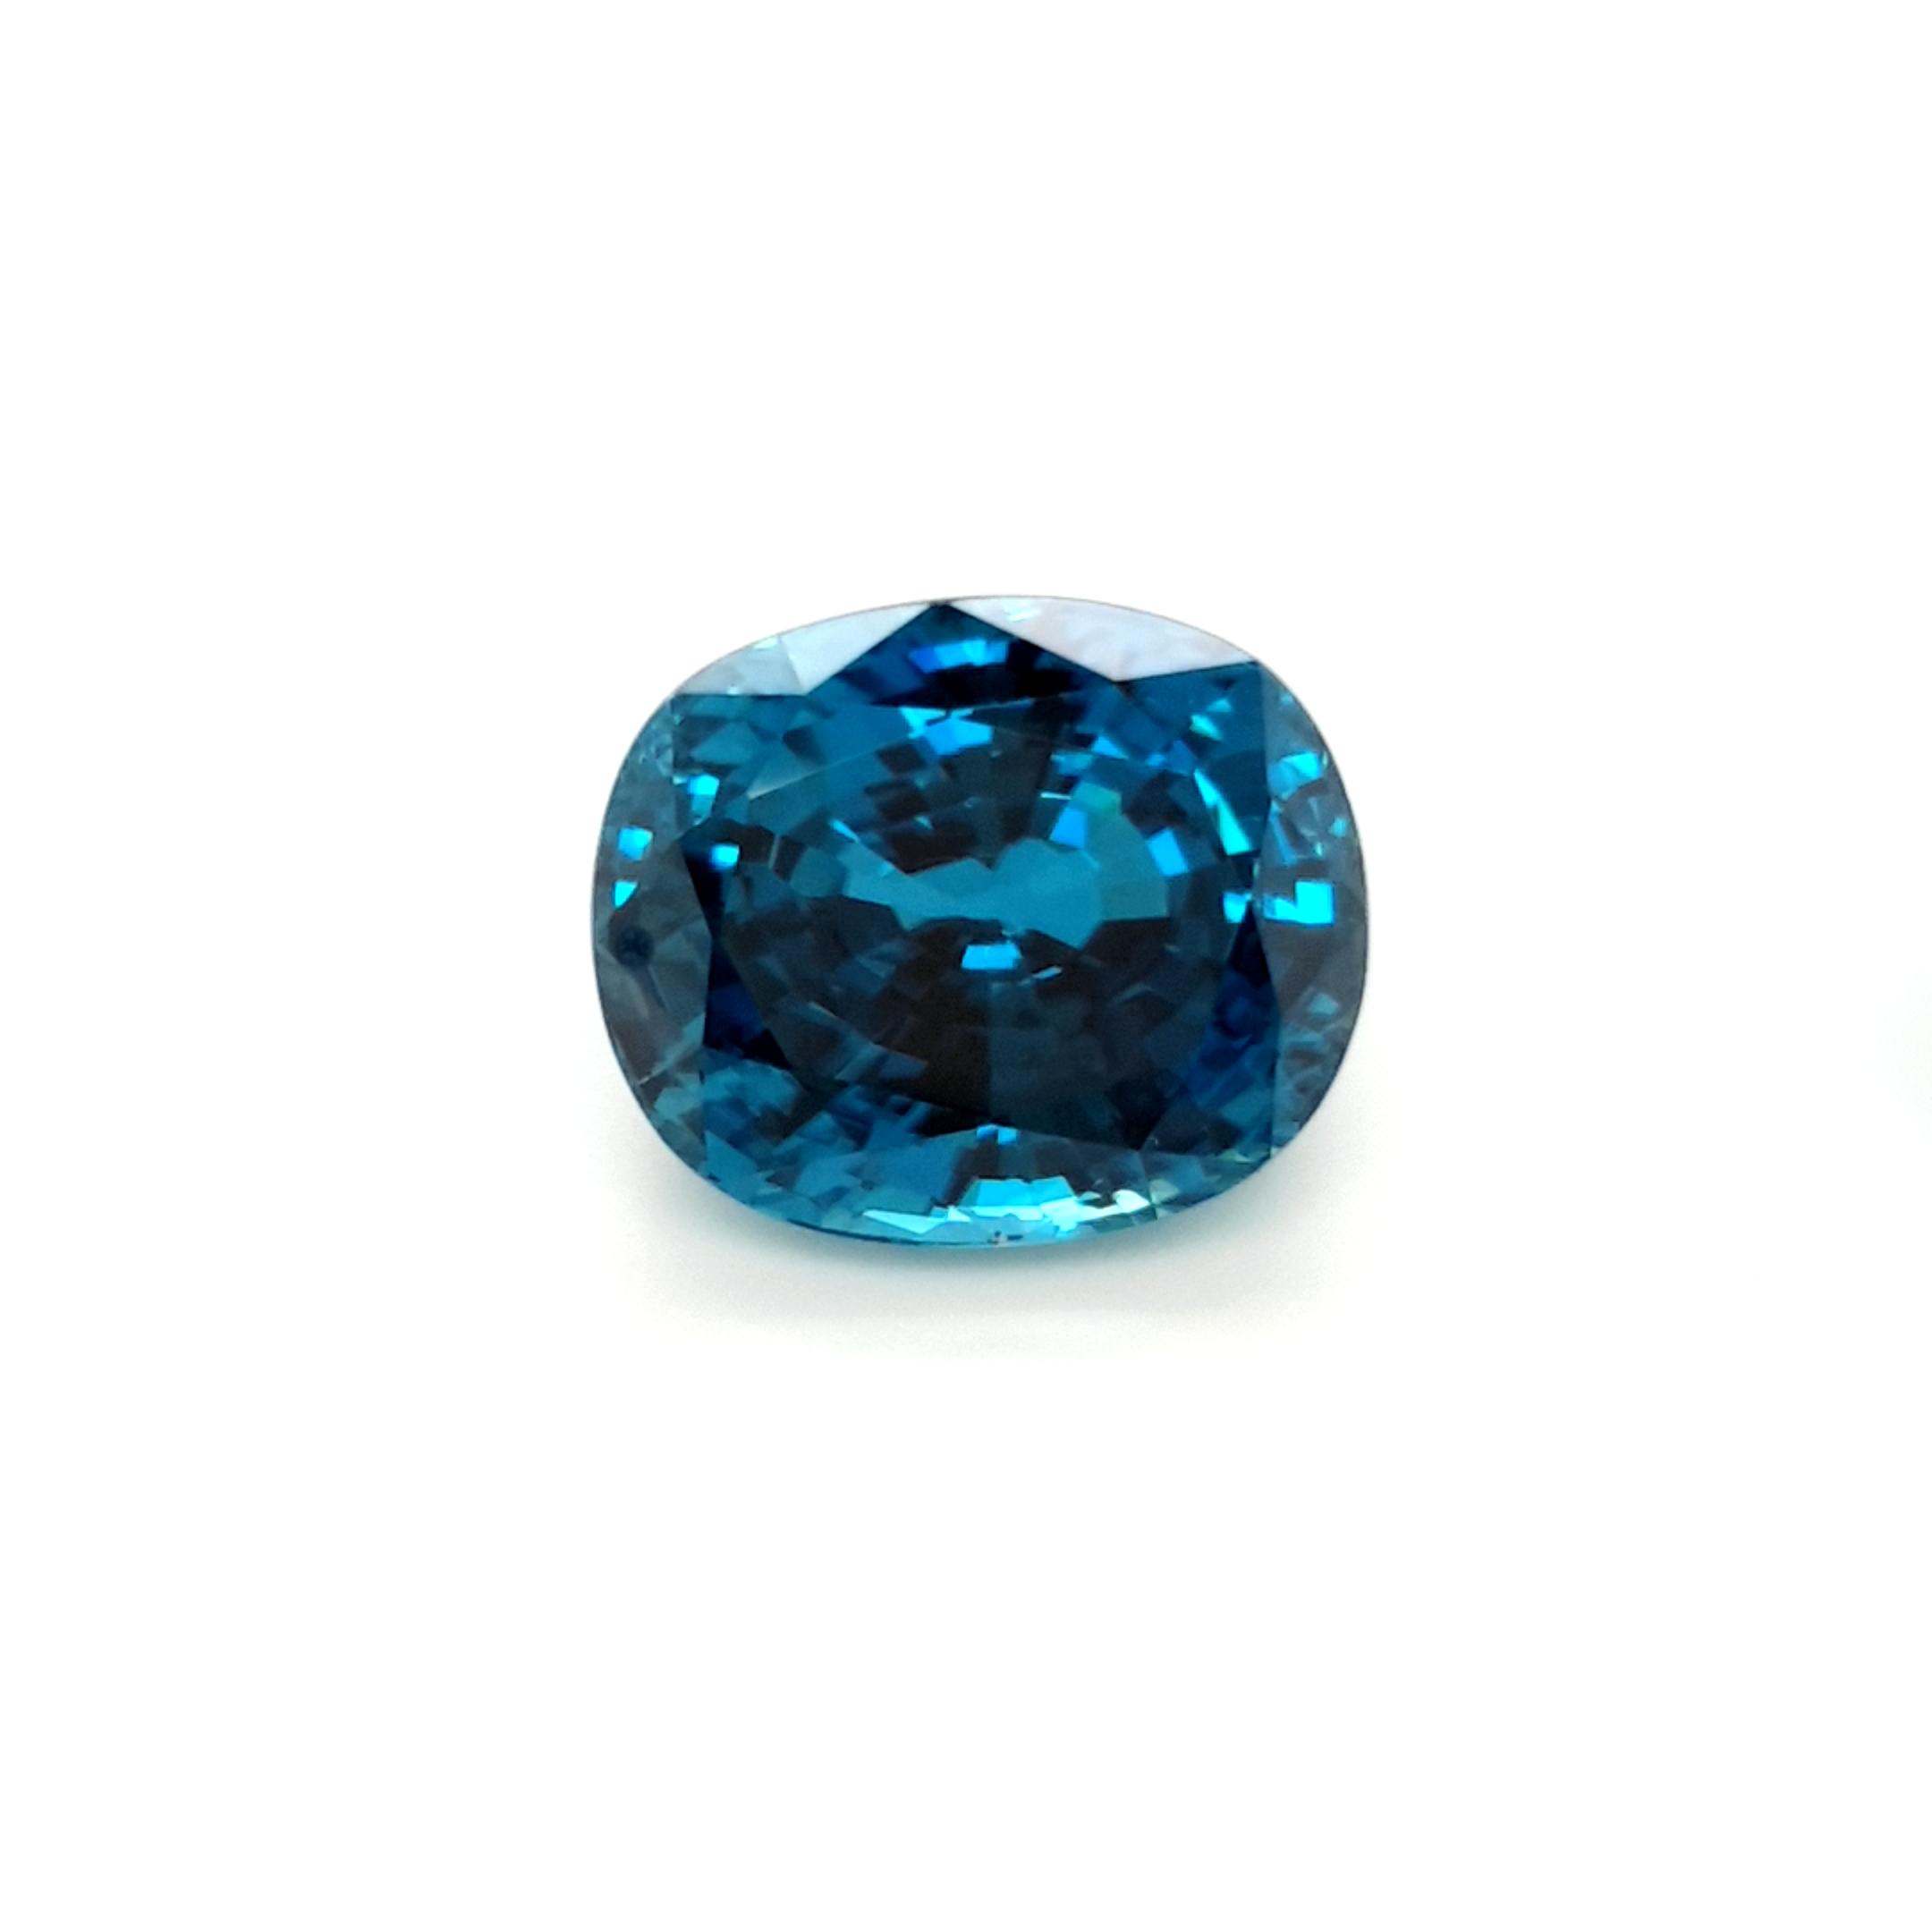 14,25ct Starlight Blue Zircon ZCD16D5 ClaudiaHamann__2021-04-16-19-37-43